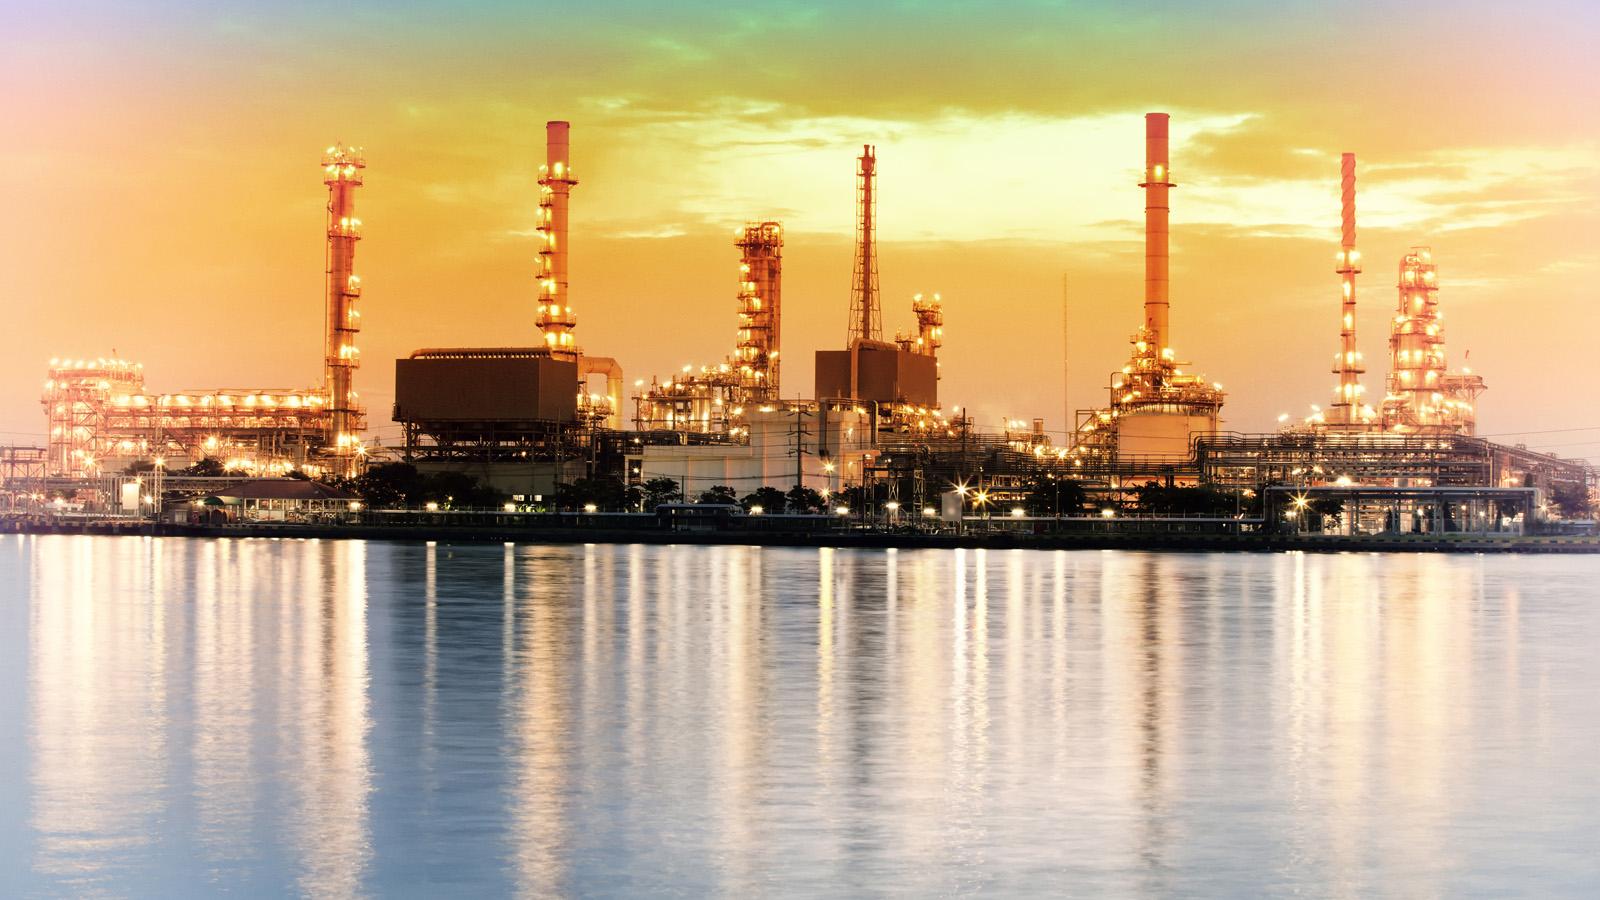 refinery on the coast